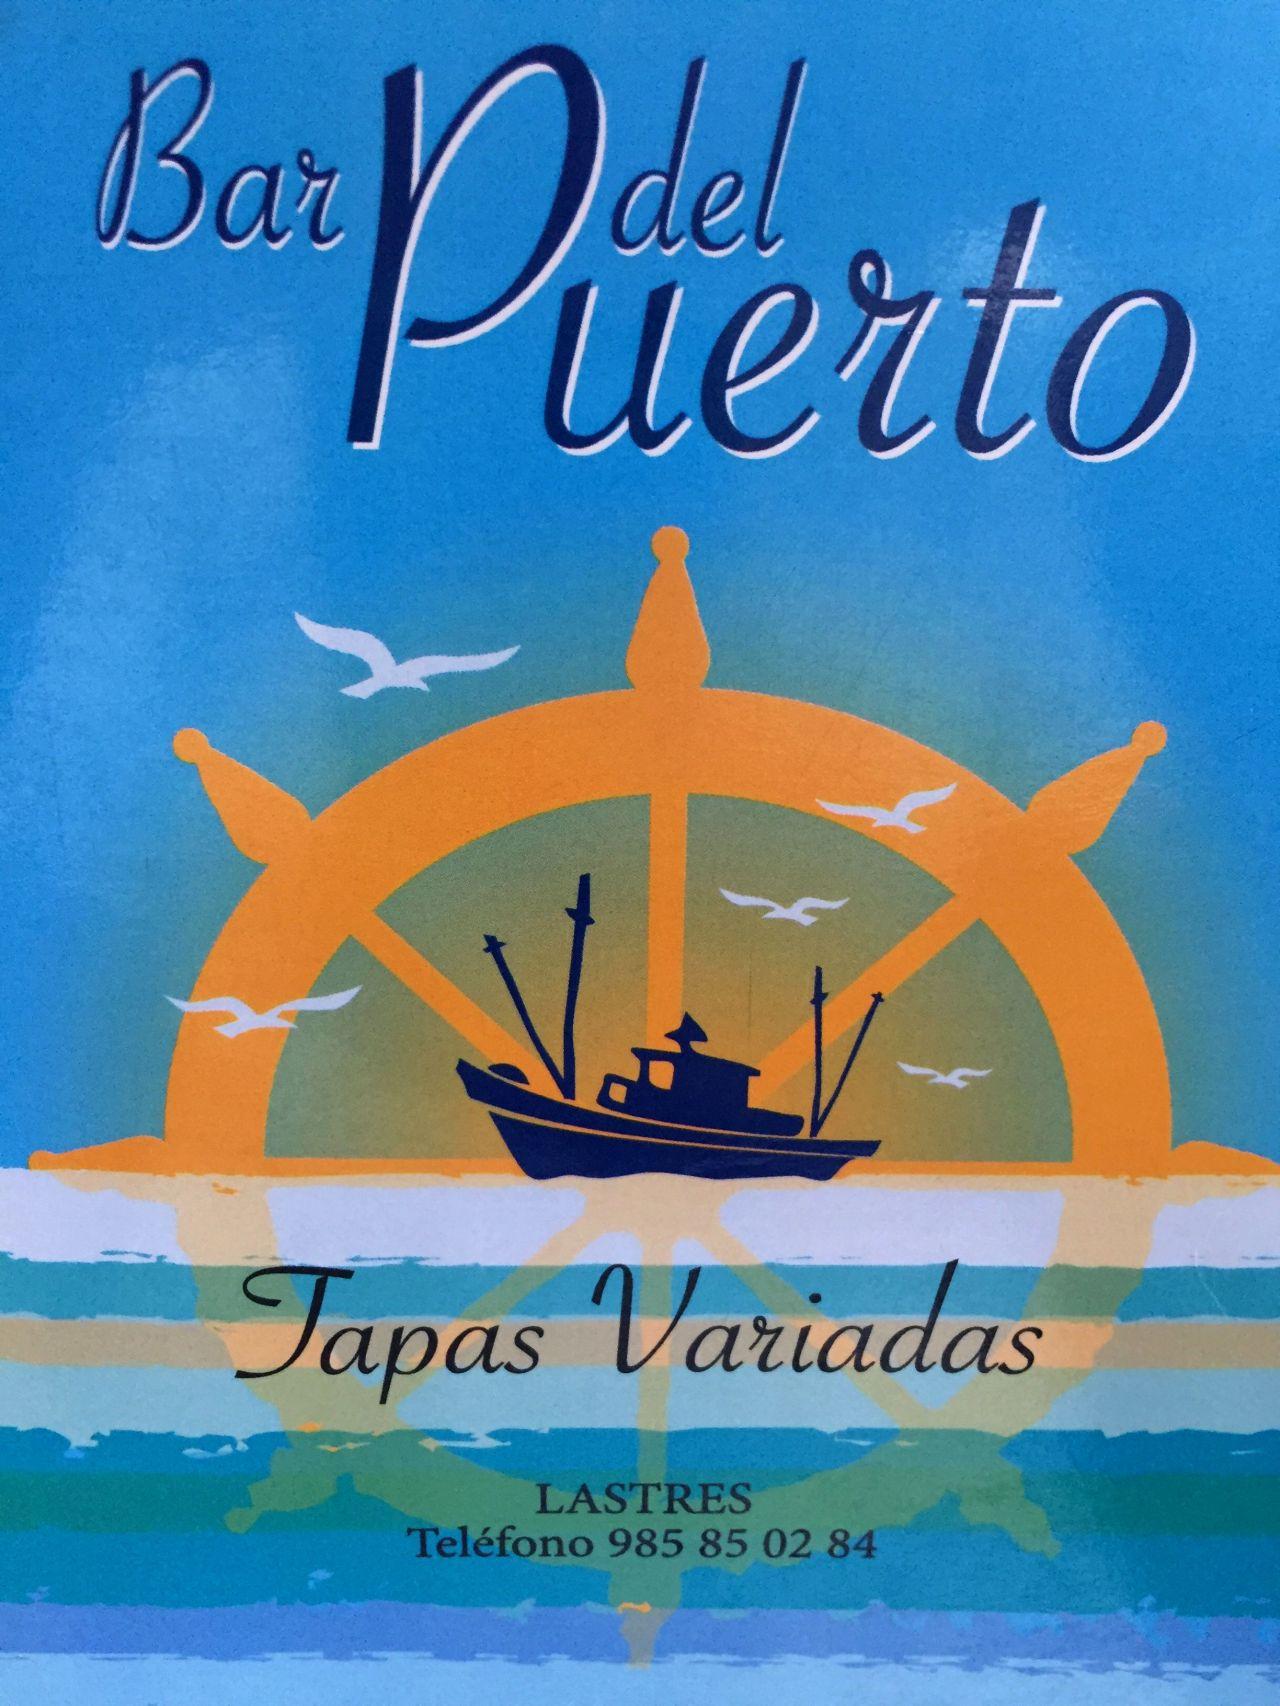 Bar del Puerto